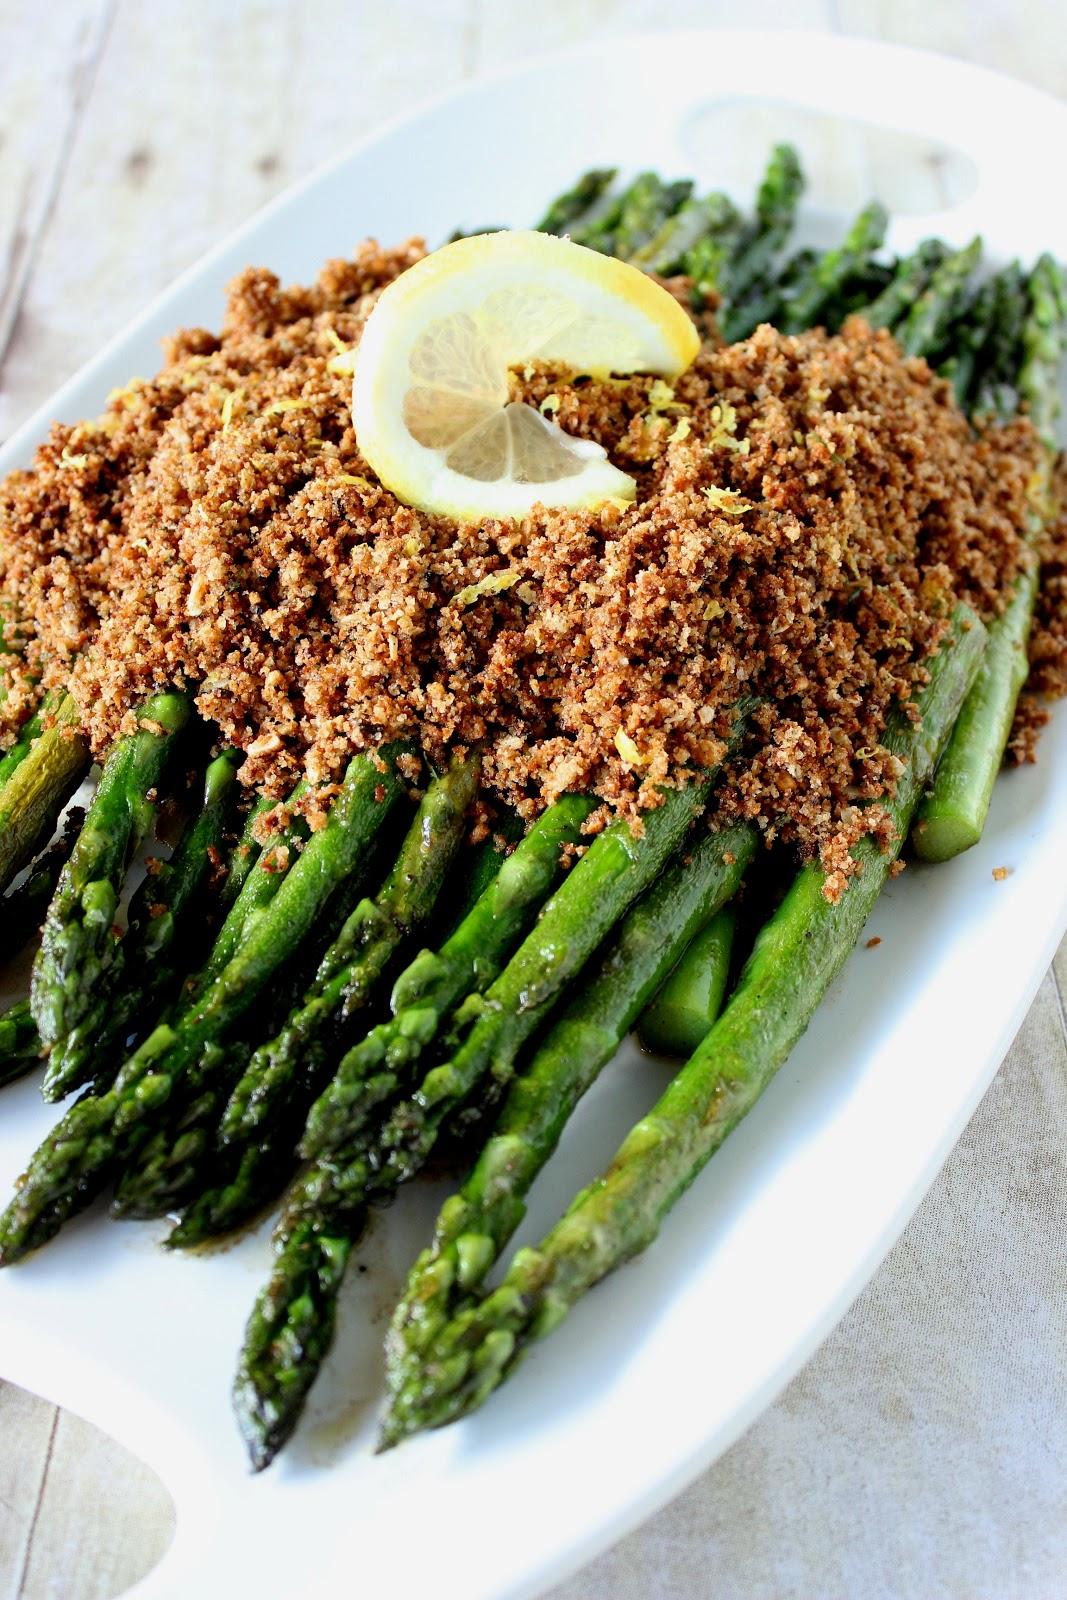 http://www.kudoskitchenbyrenee.com/2014/07/grandmas-asparagus-with-seasoned.html